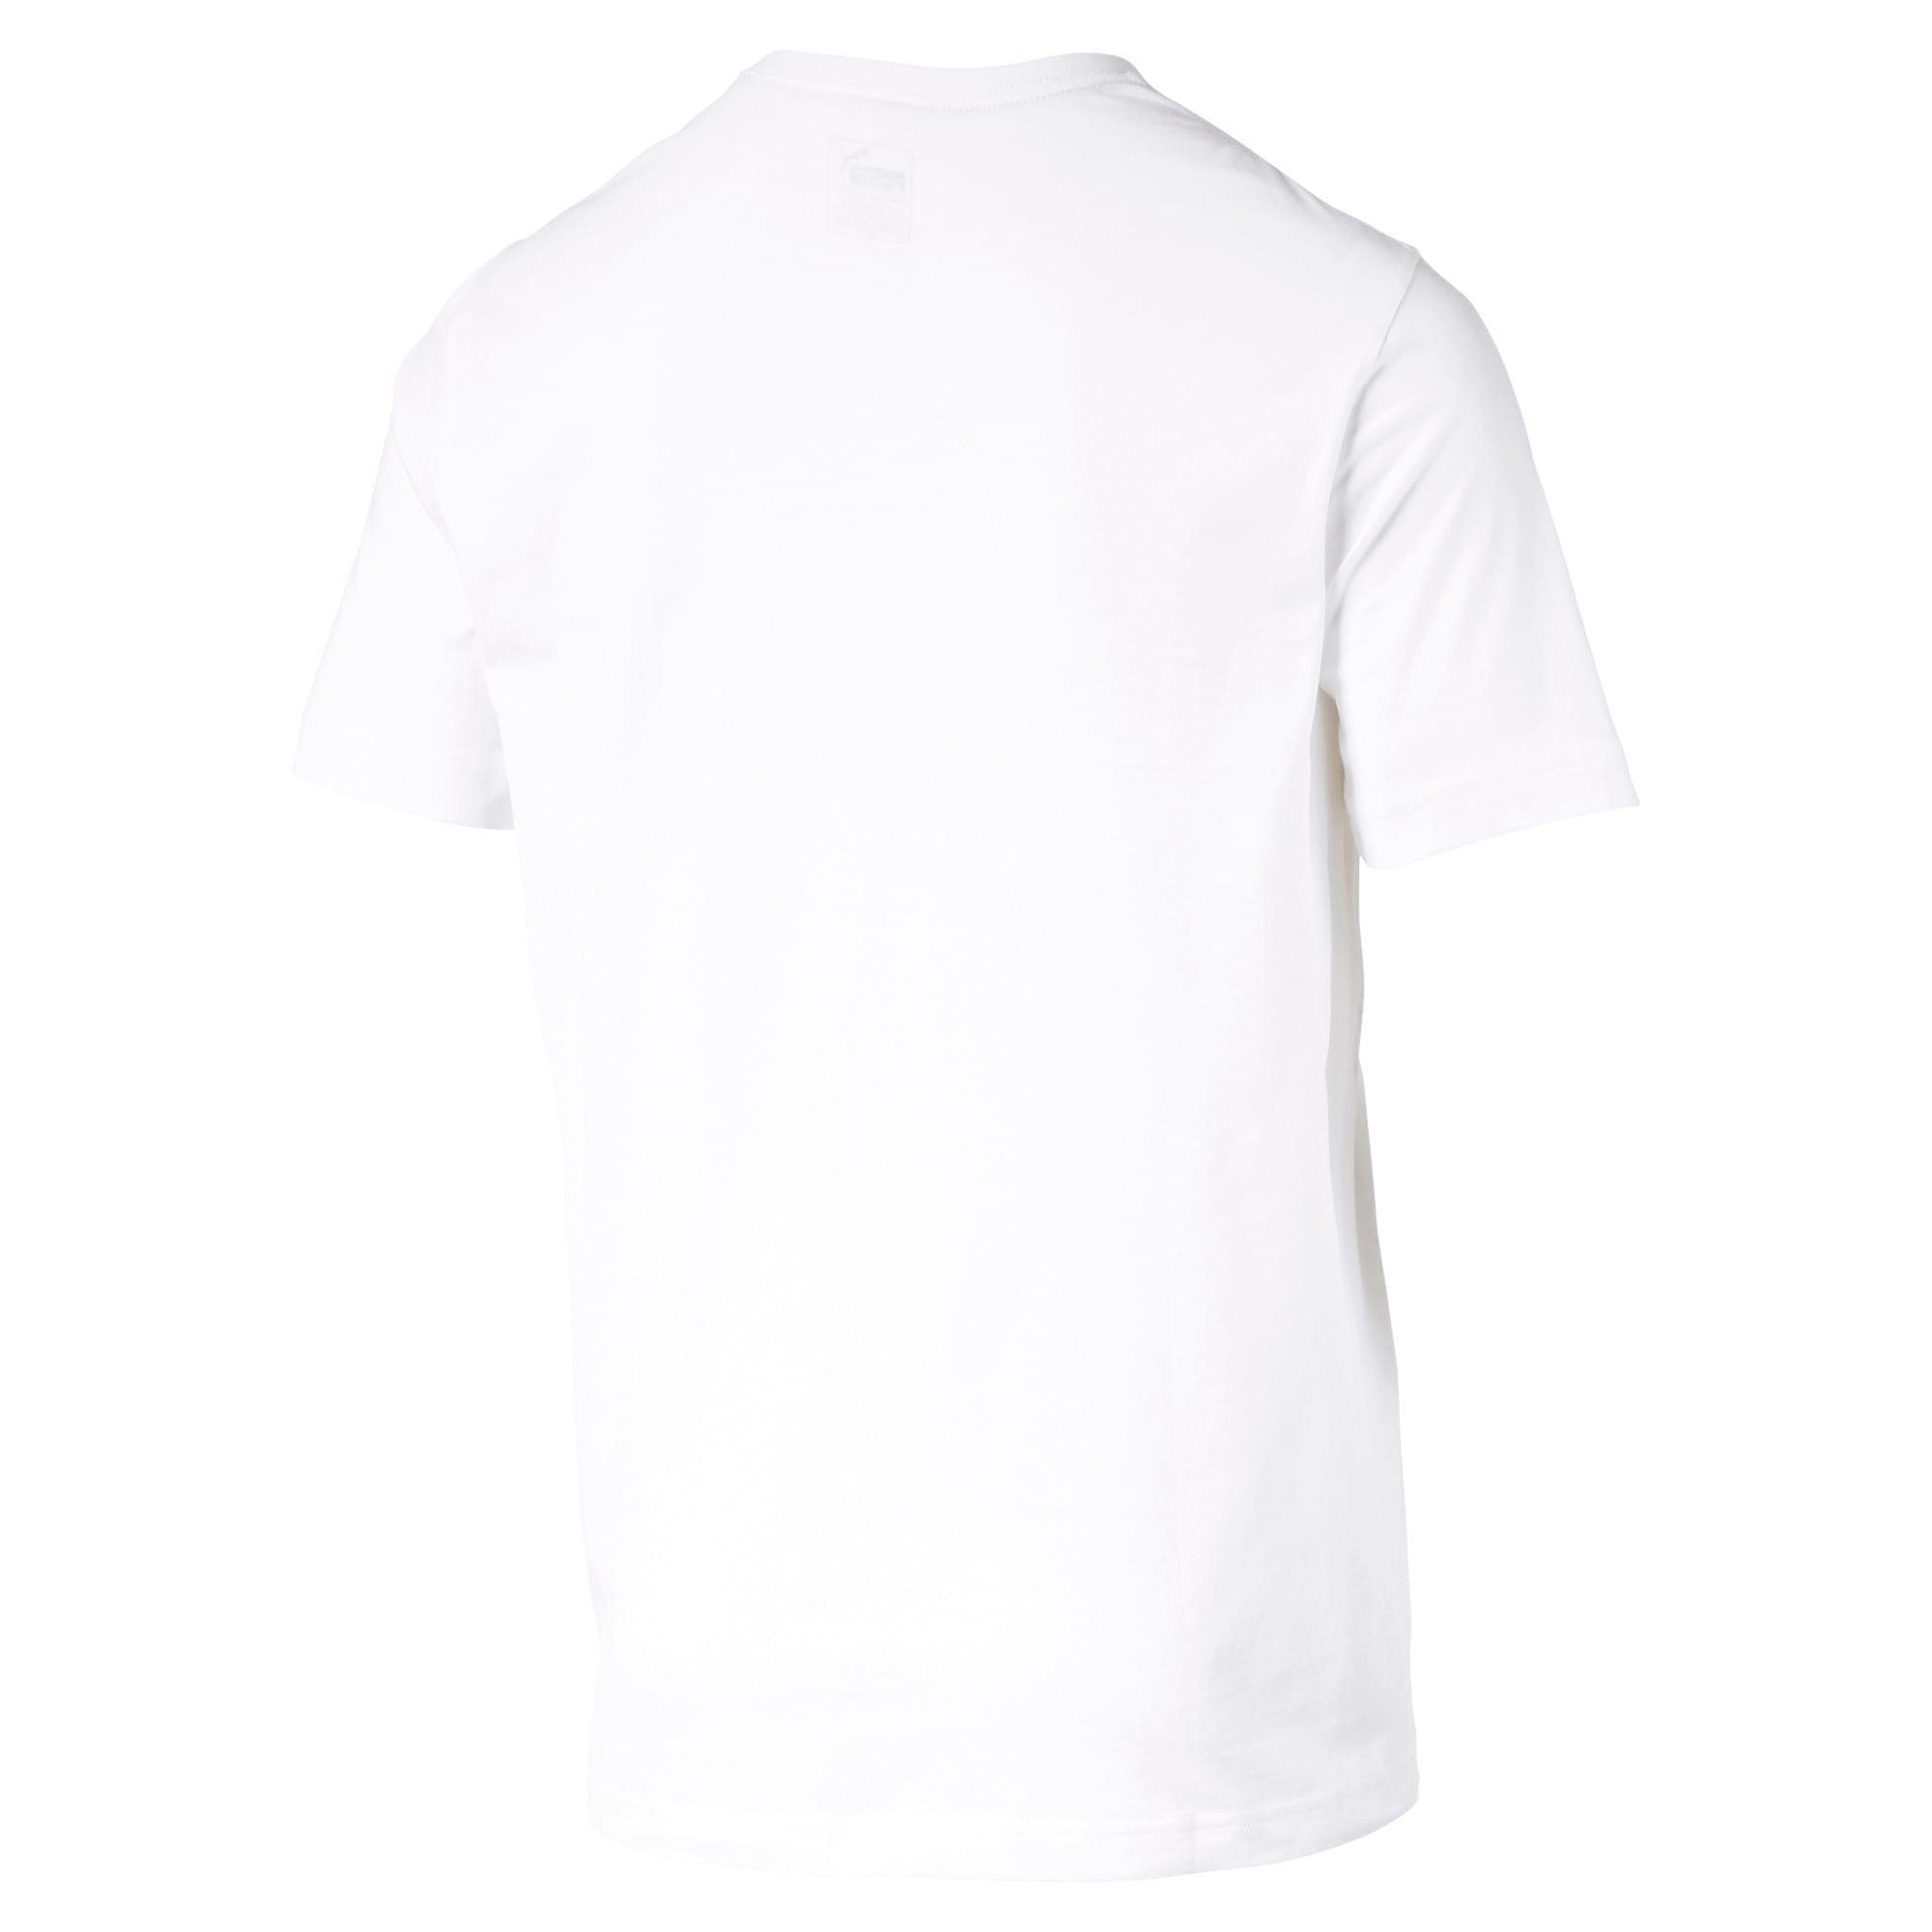 Thumbnail 5 of T-shirt a maniche corte Essentials uomo, Puma White, medium